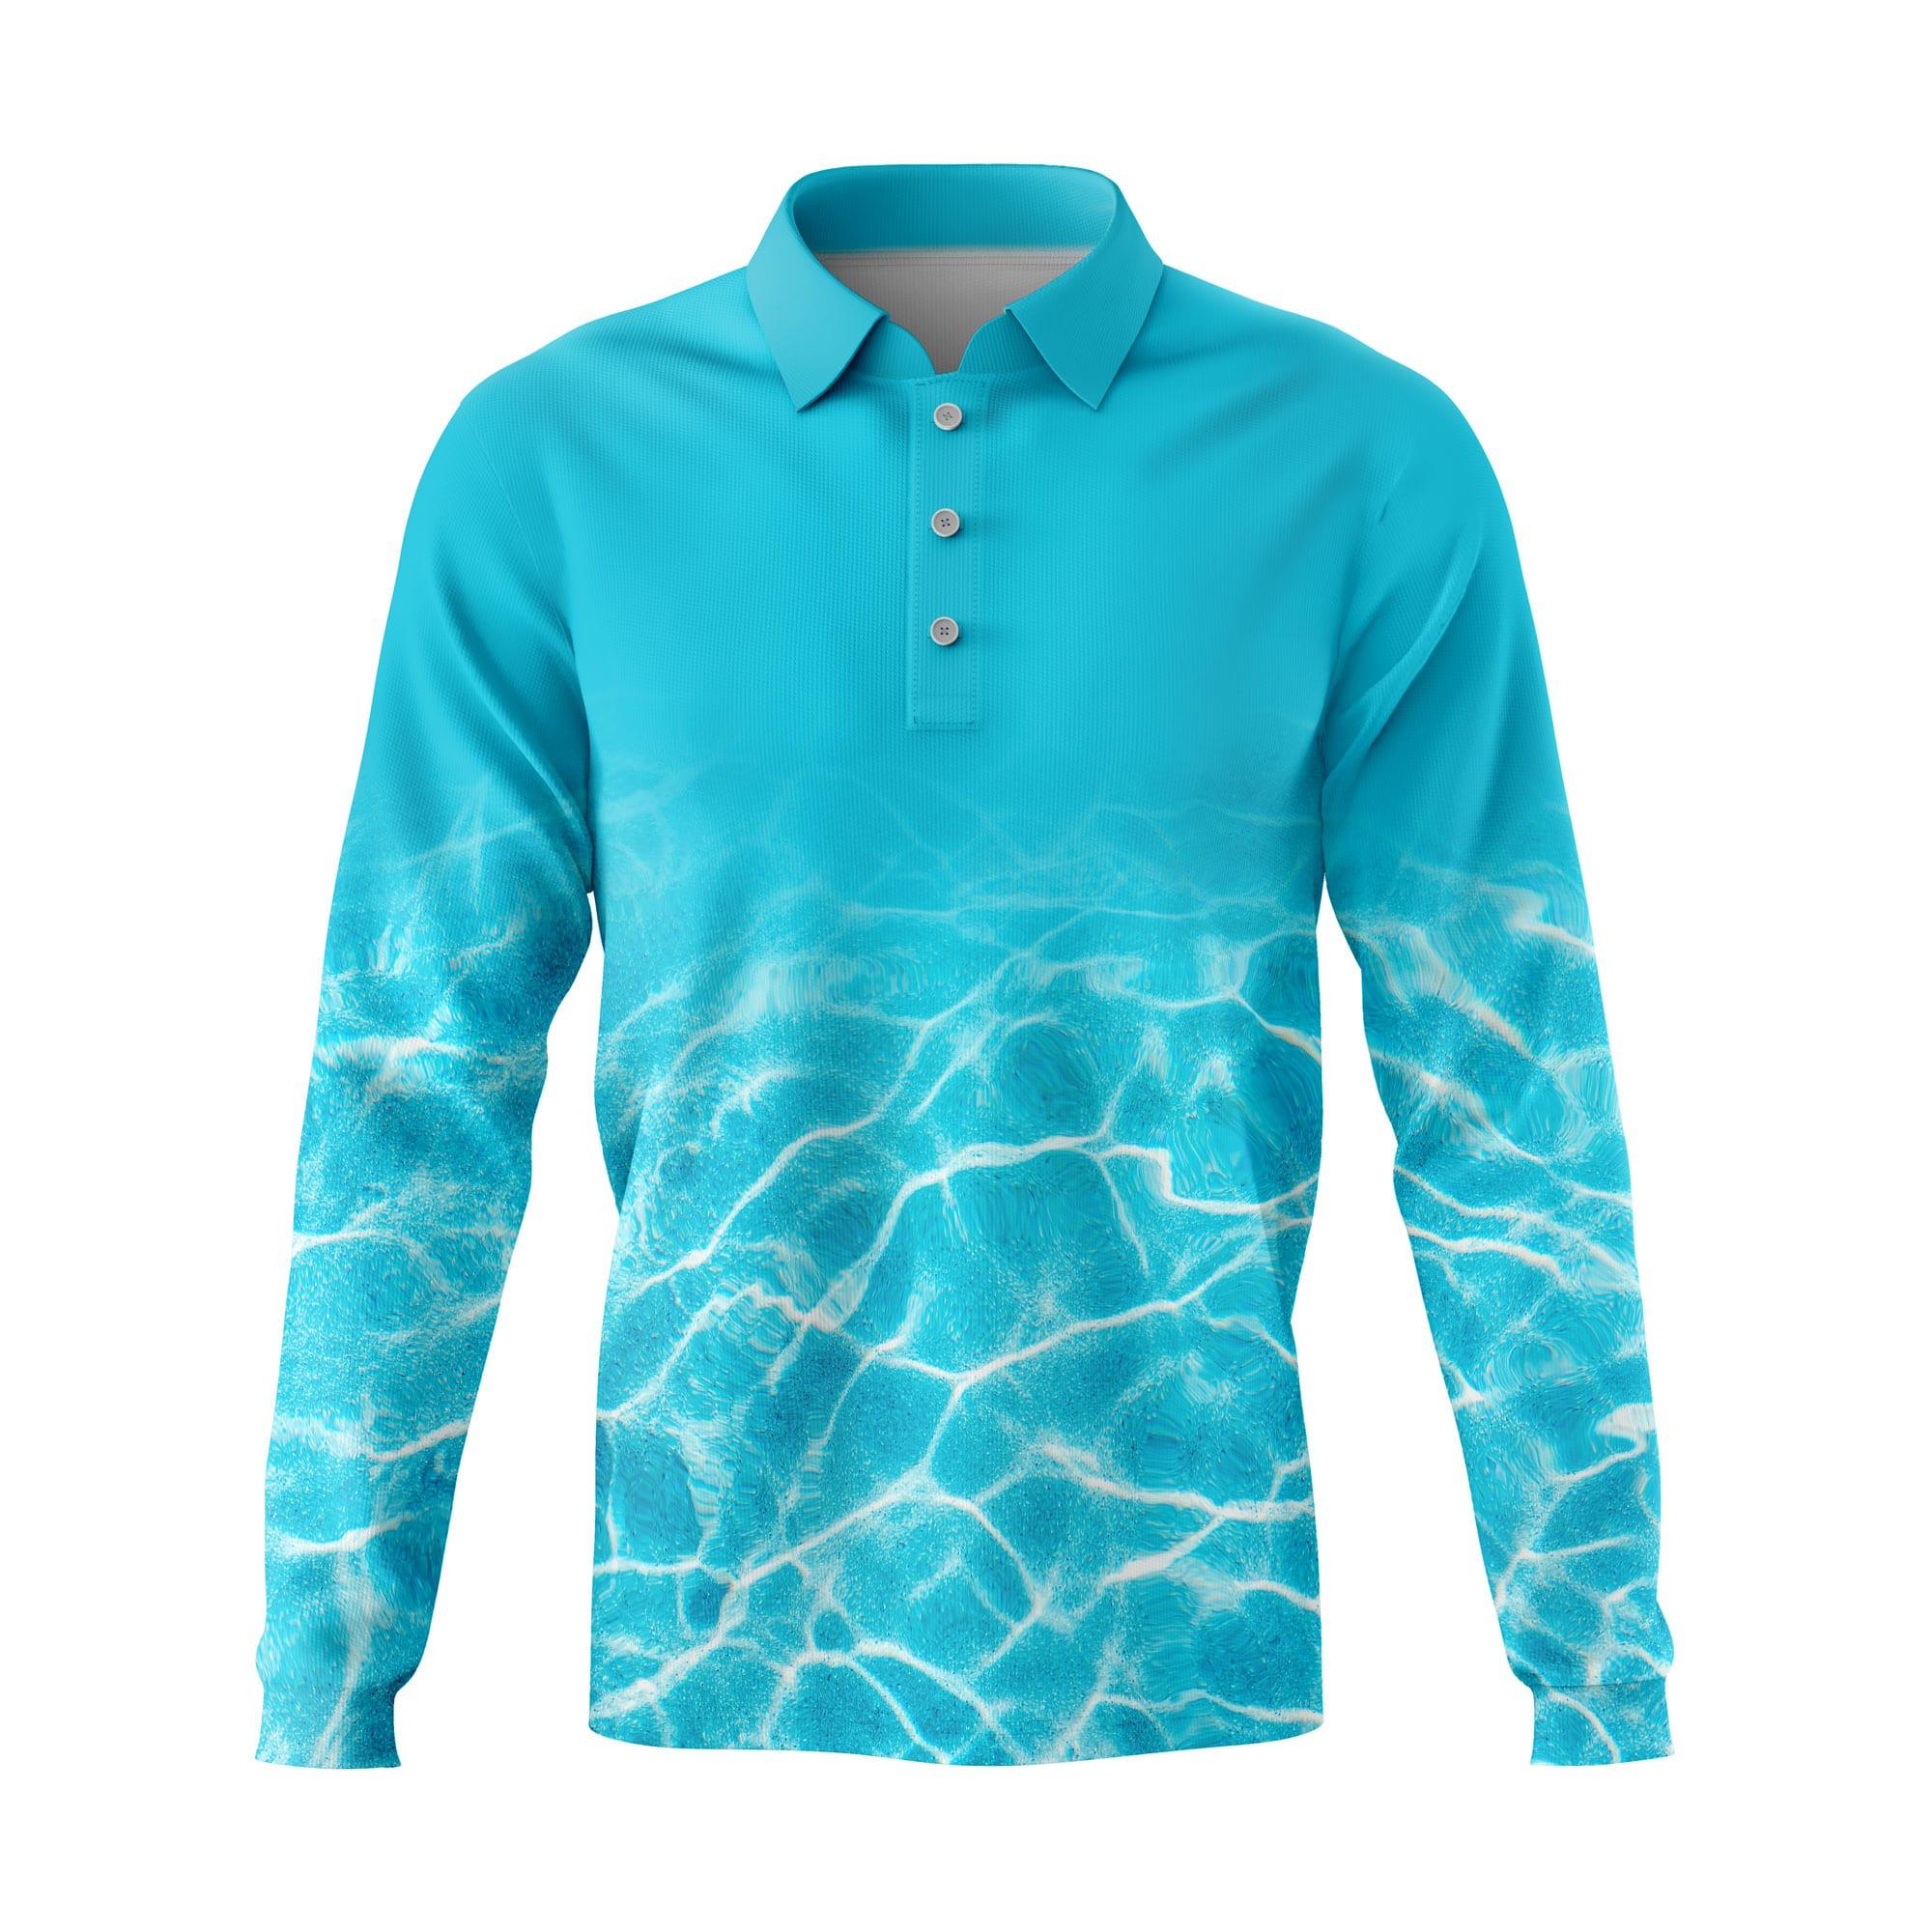 Reflection-Fishing-shirts-Front-3D-